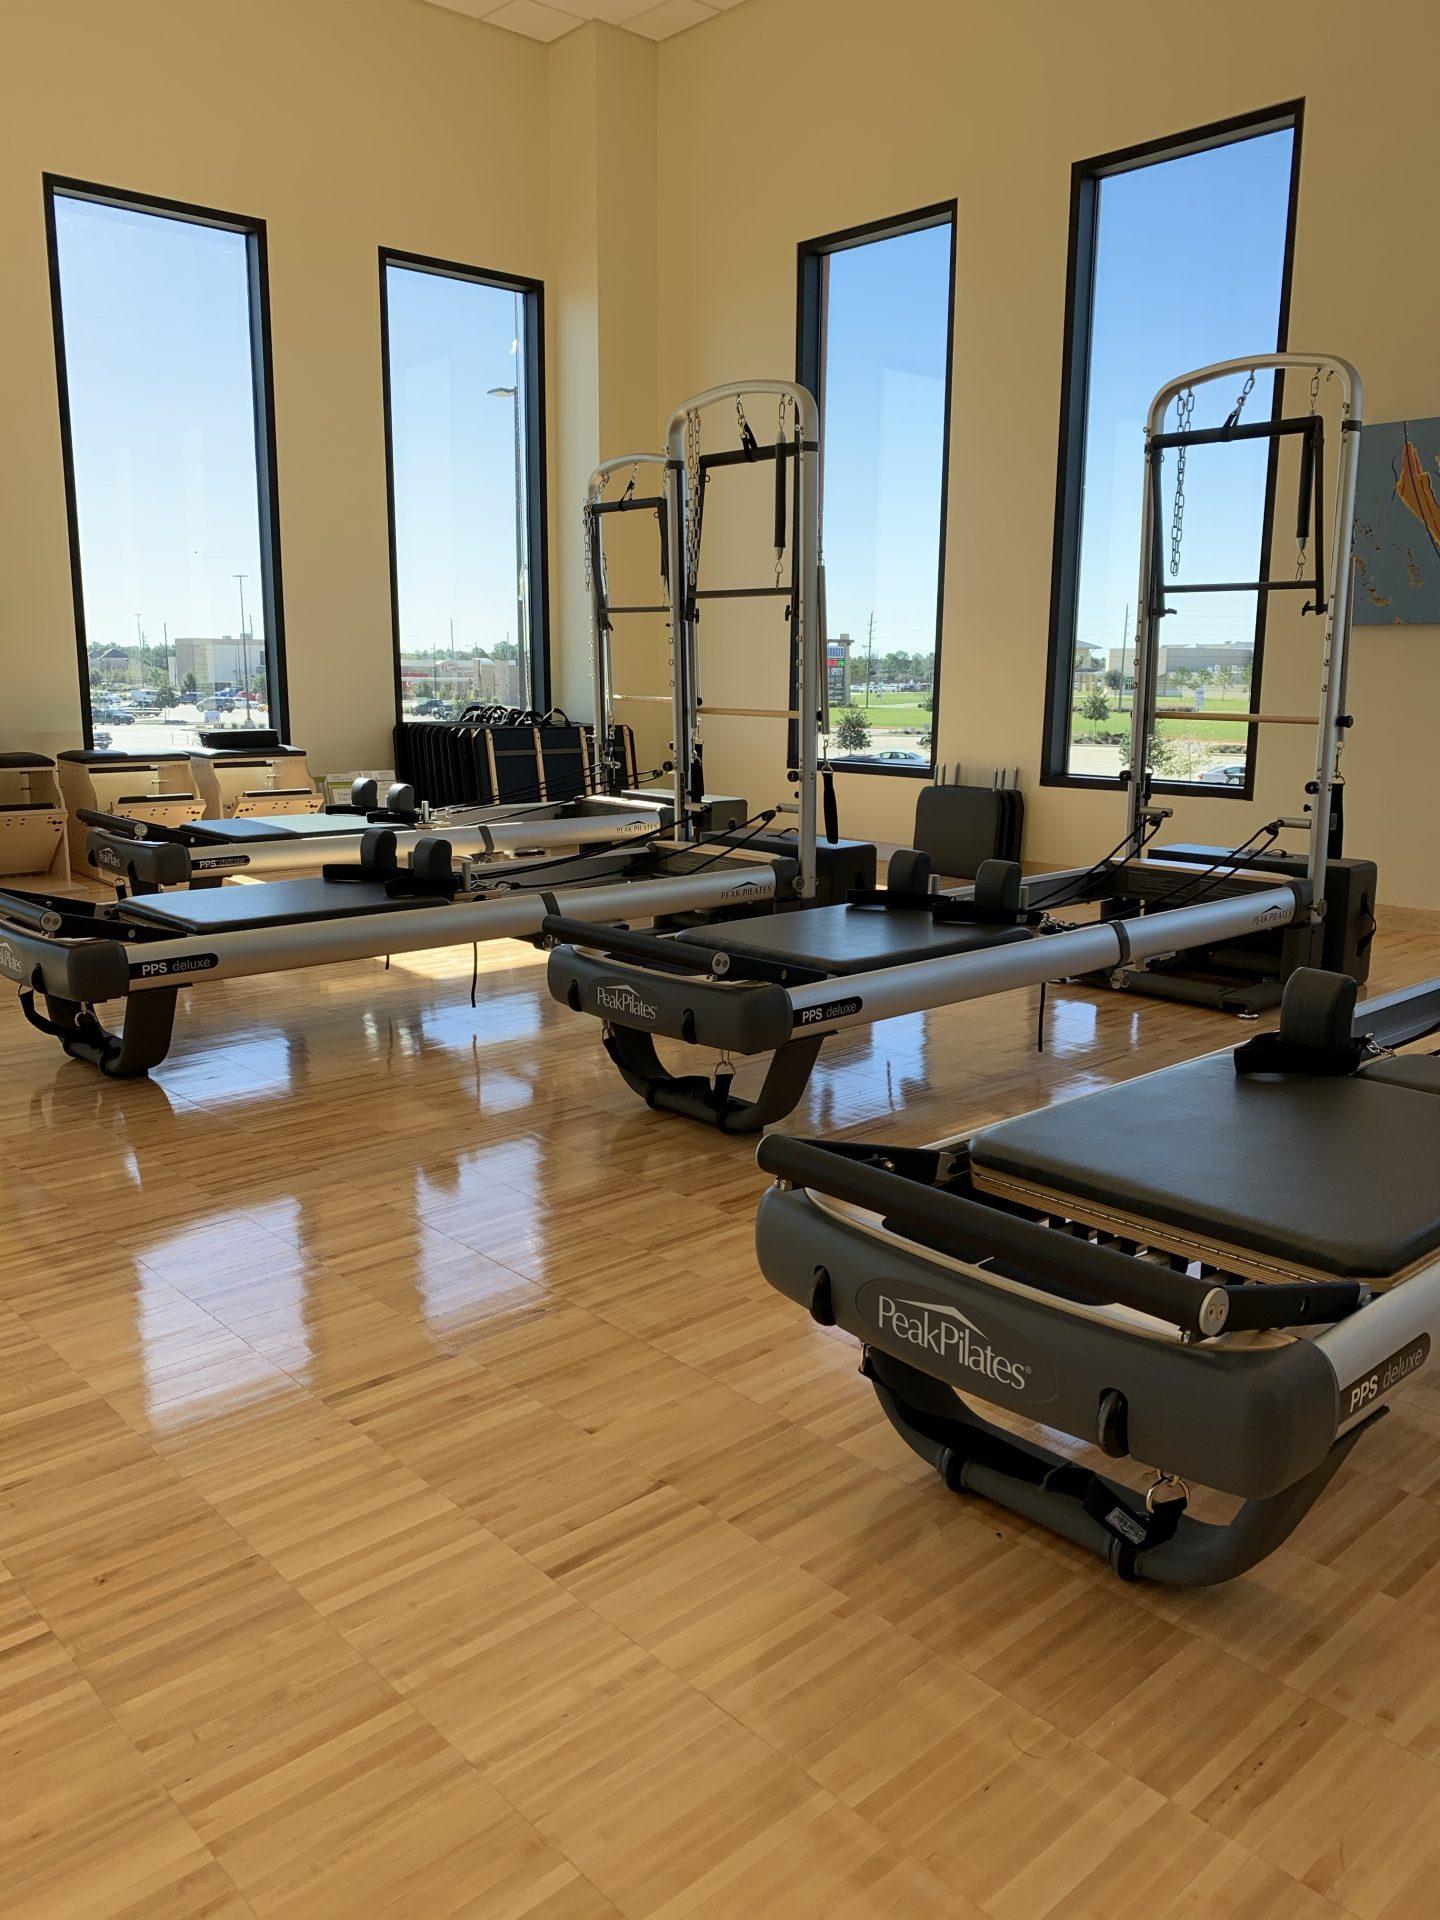 pilates reformer - gyms in katy tx - villa sport cinco ranch